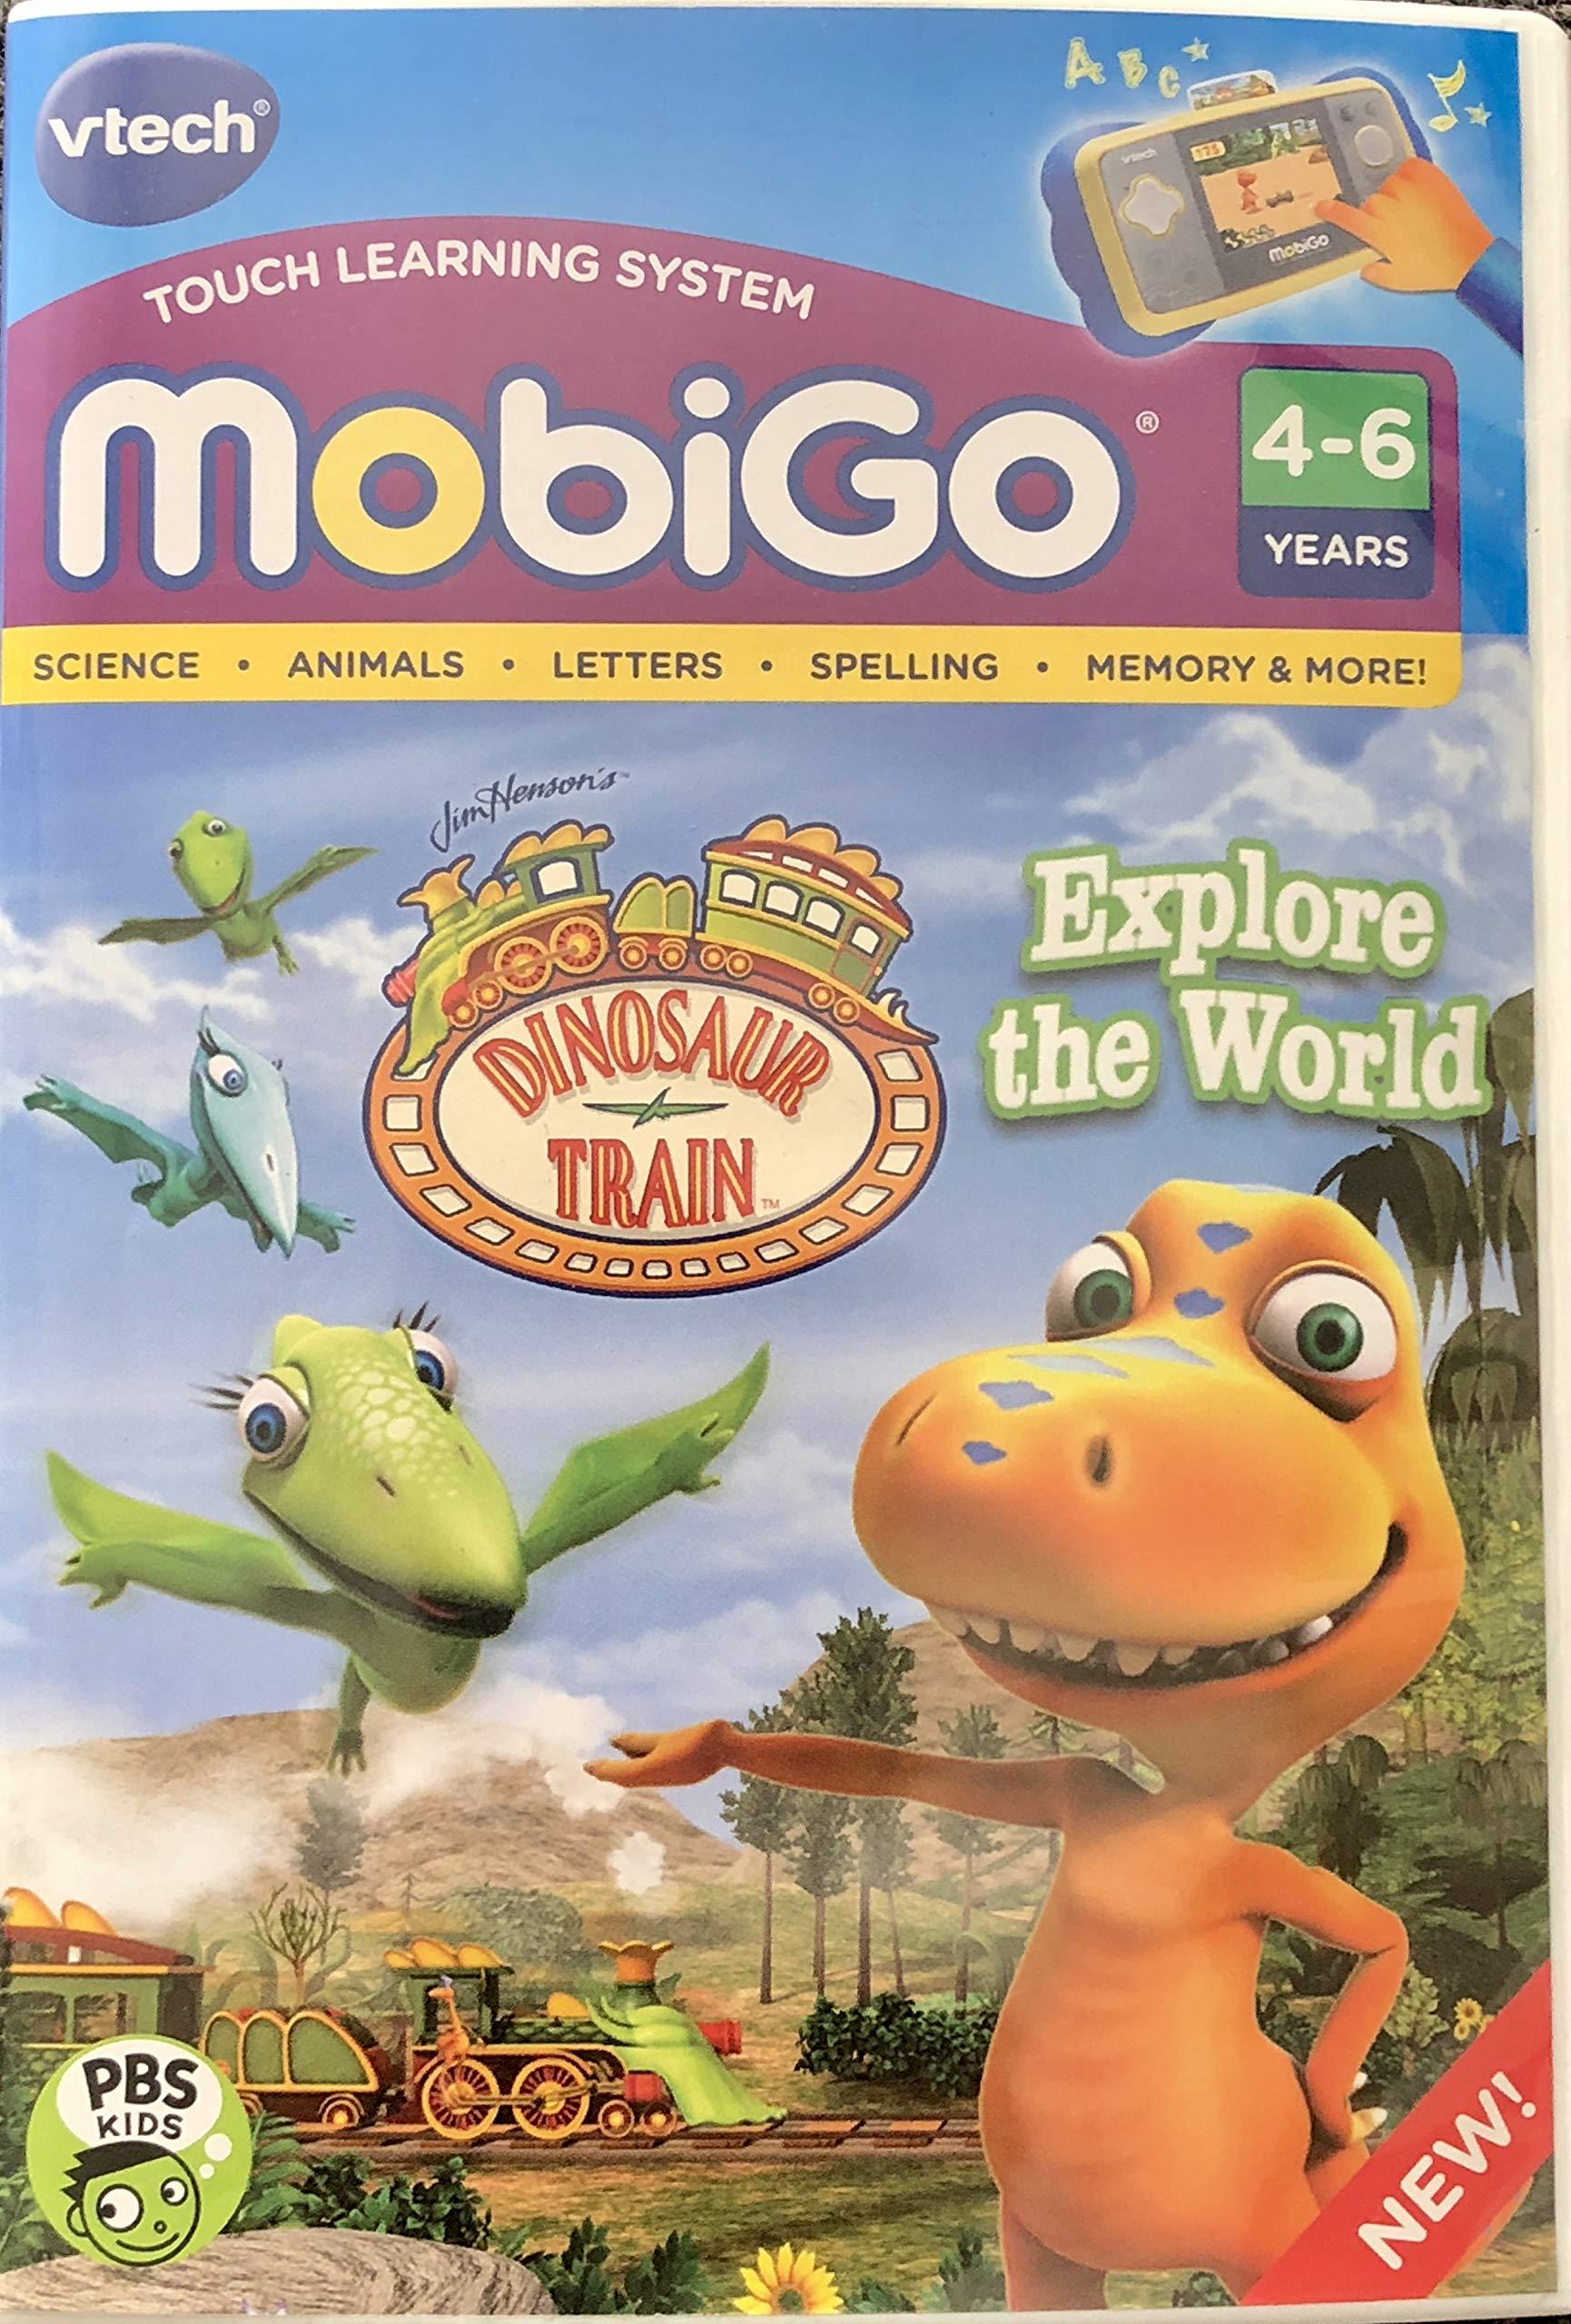 MobiGo Vtech Touch Learning System Bundle Includes: 3X Games - Disney Princess, Dinosaur Train, Monsters University & $20 Download Card (Bundle Three) by MobiGo (Image #1)